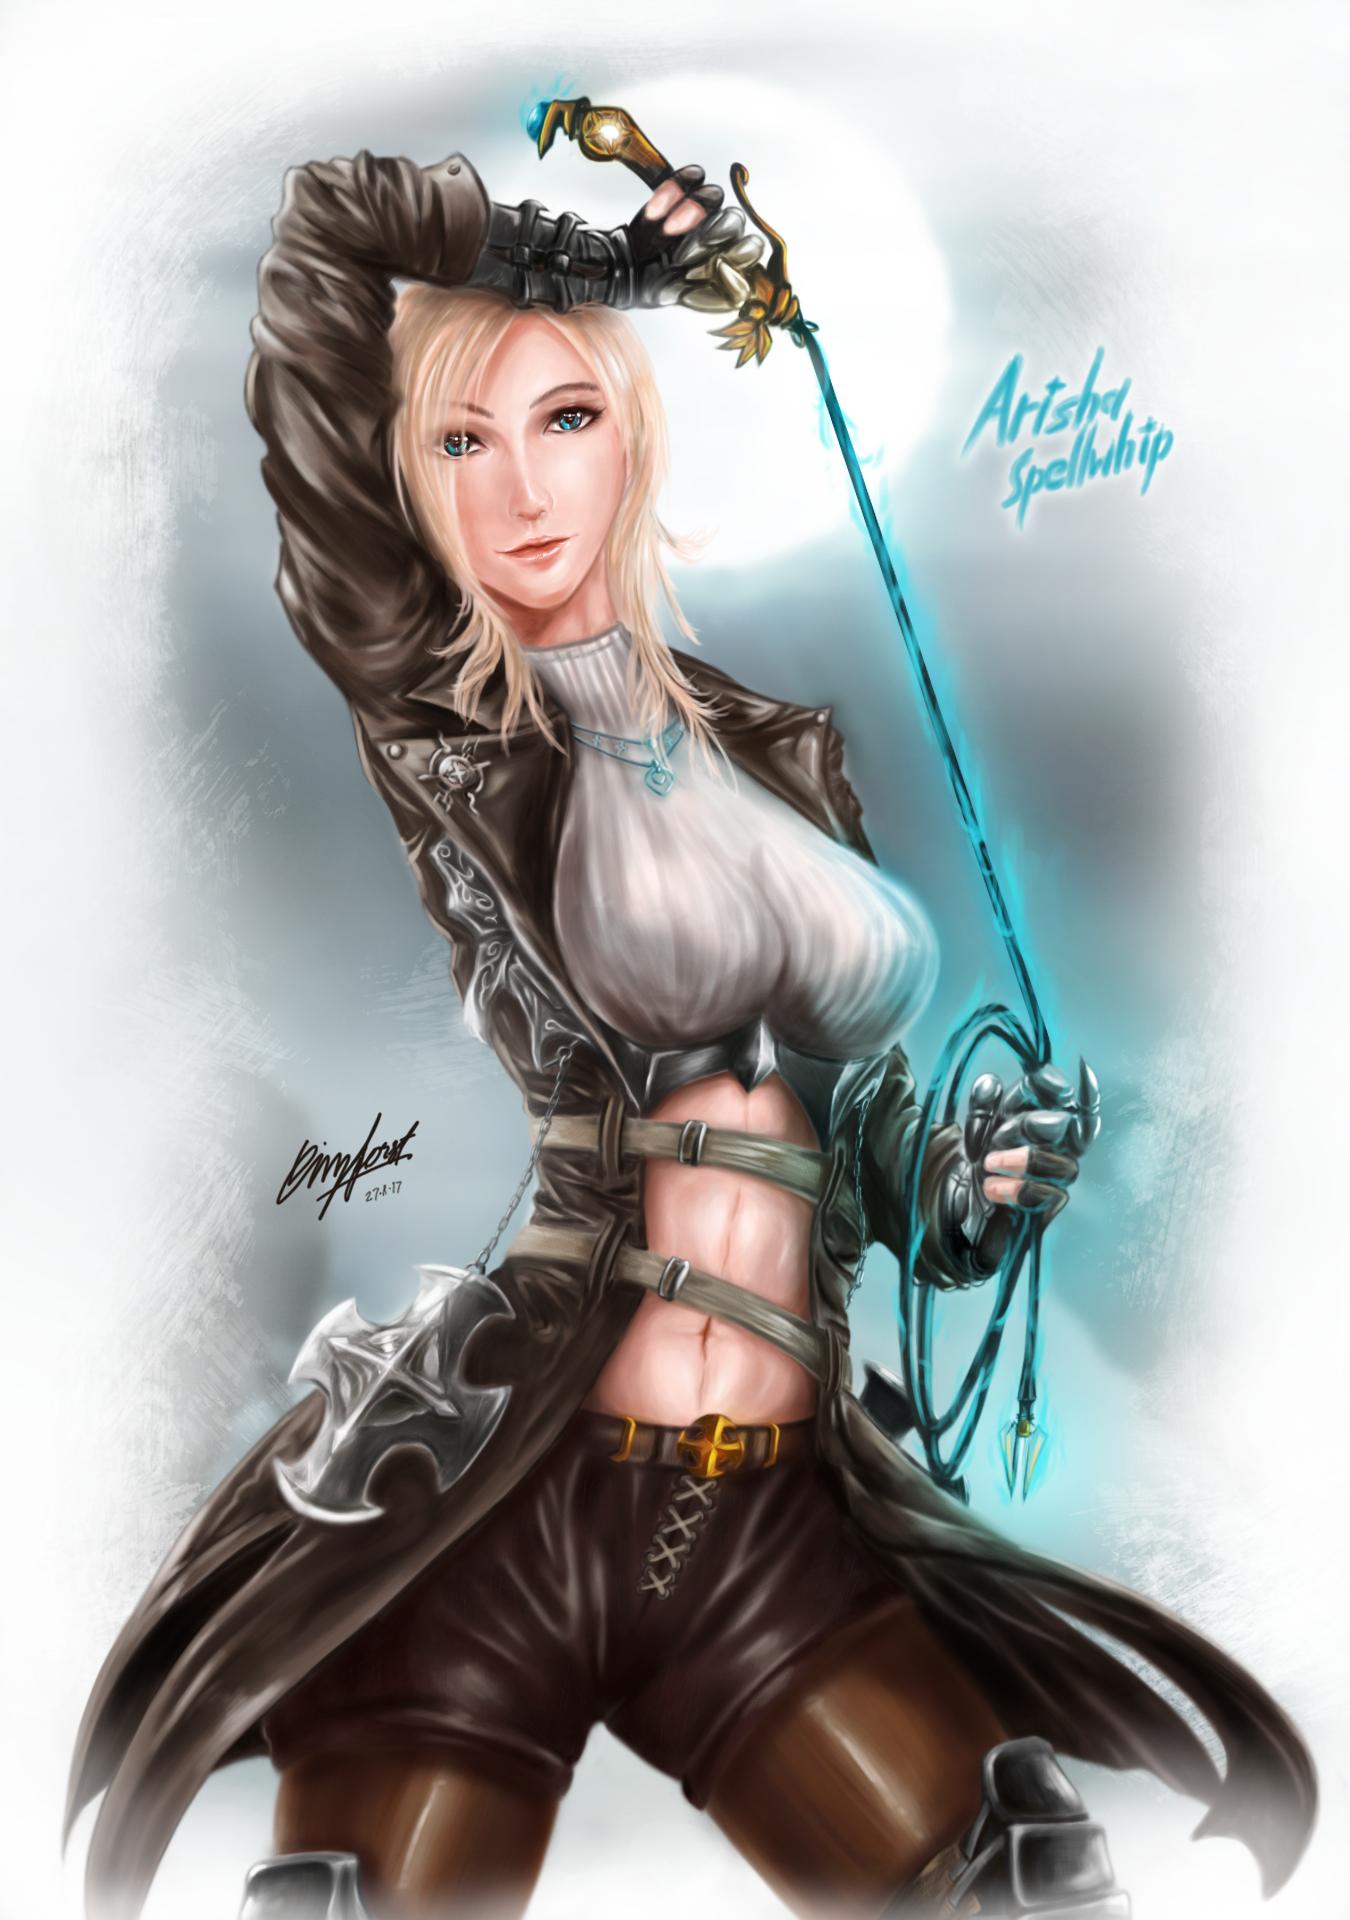 arisha___spellwhip_concept_by_dinnyforst-dblhxfj.png